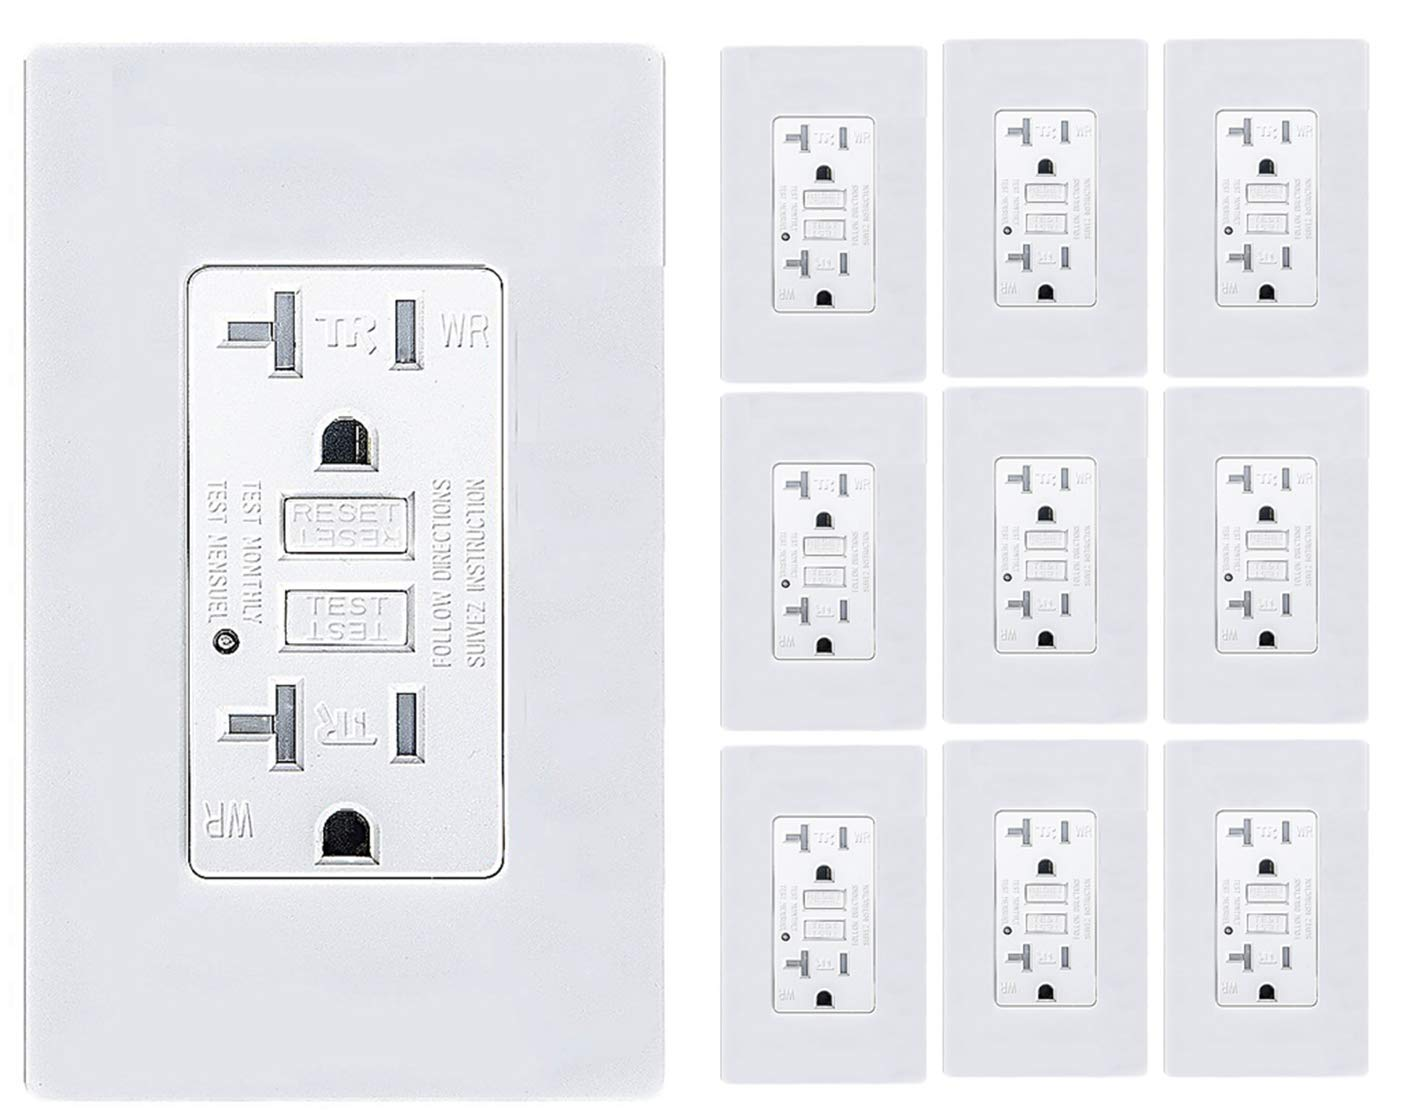 Teklectric - GFCI Receptacle 20A 125V Tamper/Weather Resistant + Wall Plate - GFCI Outlet 20 AMP 125 VOLT Grounded Water/Tamper Resistant Wall Plate Included (10)